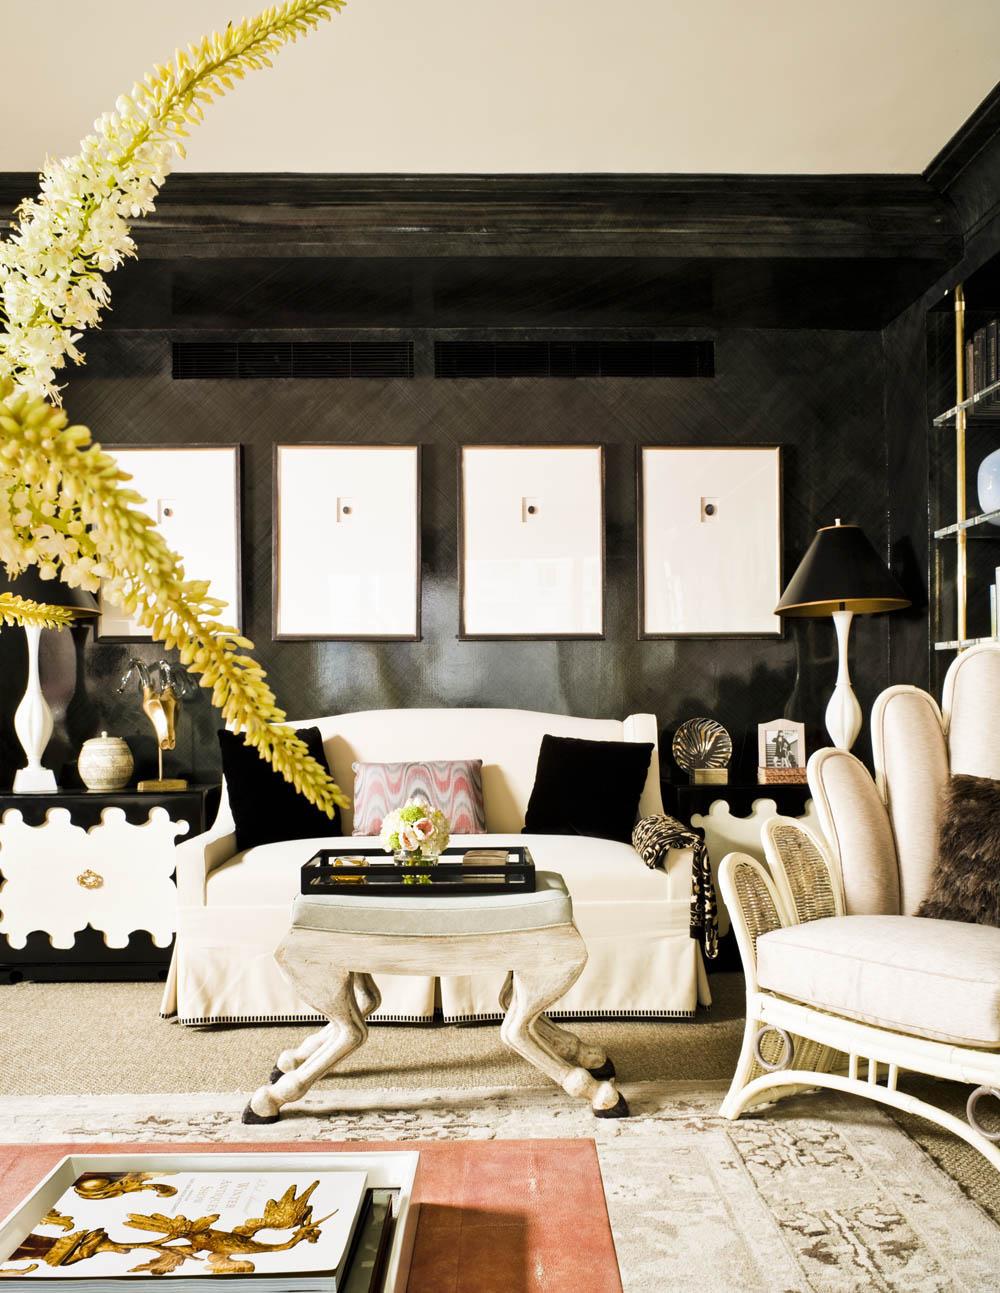 102_ManHouse-101-Kemble-Interiors.jpg